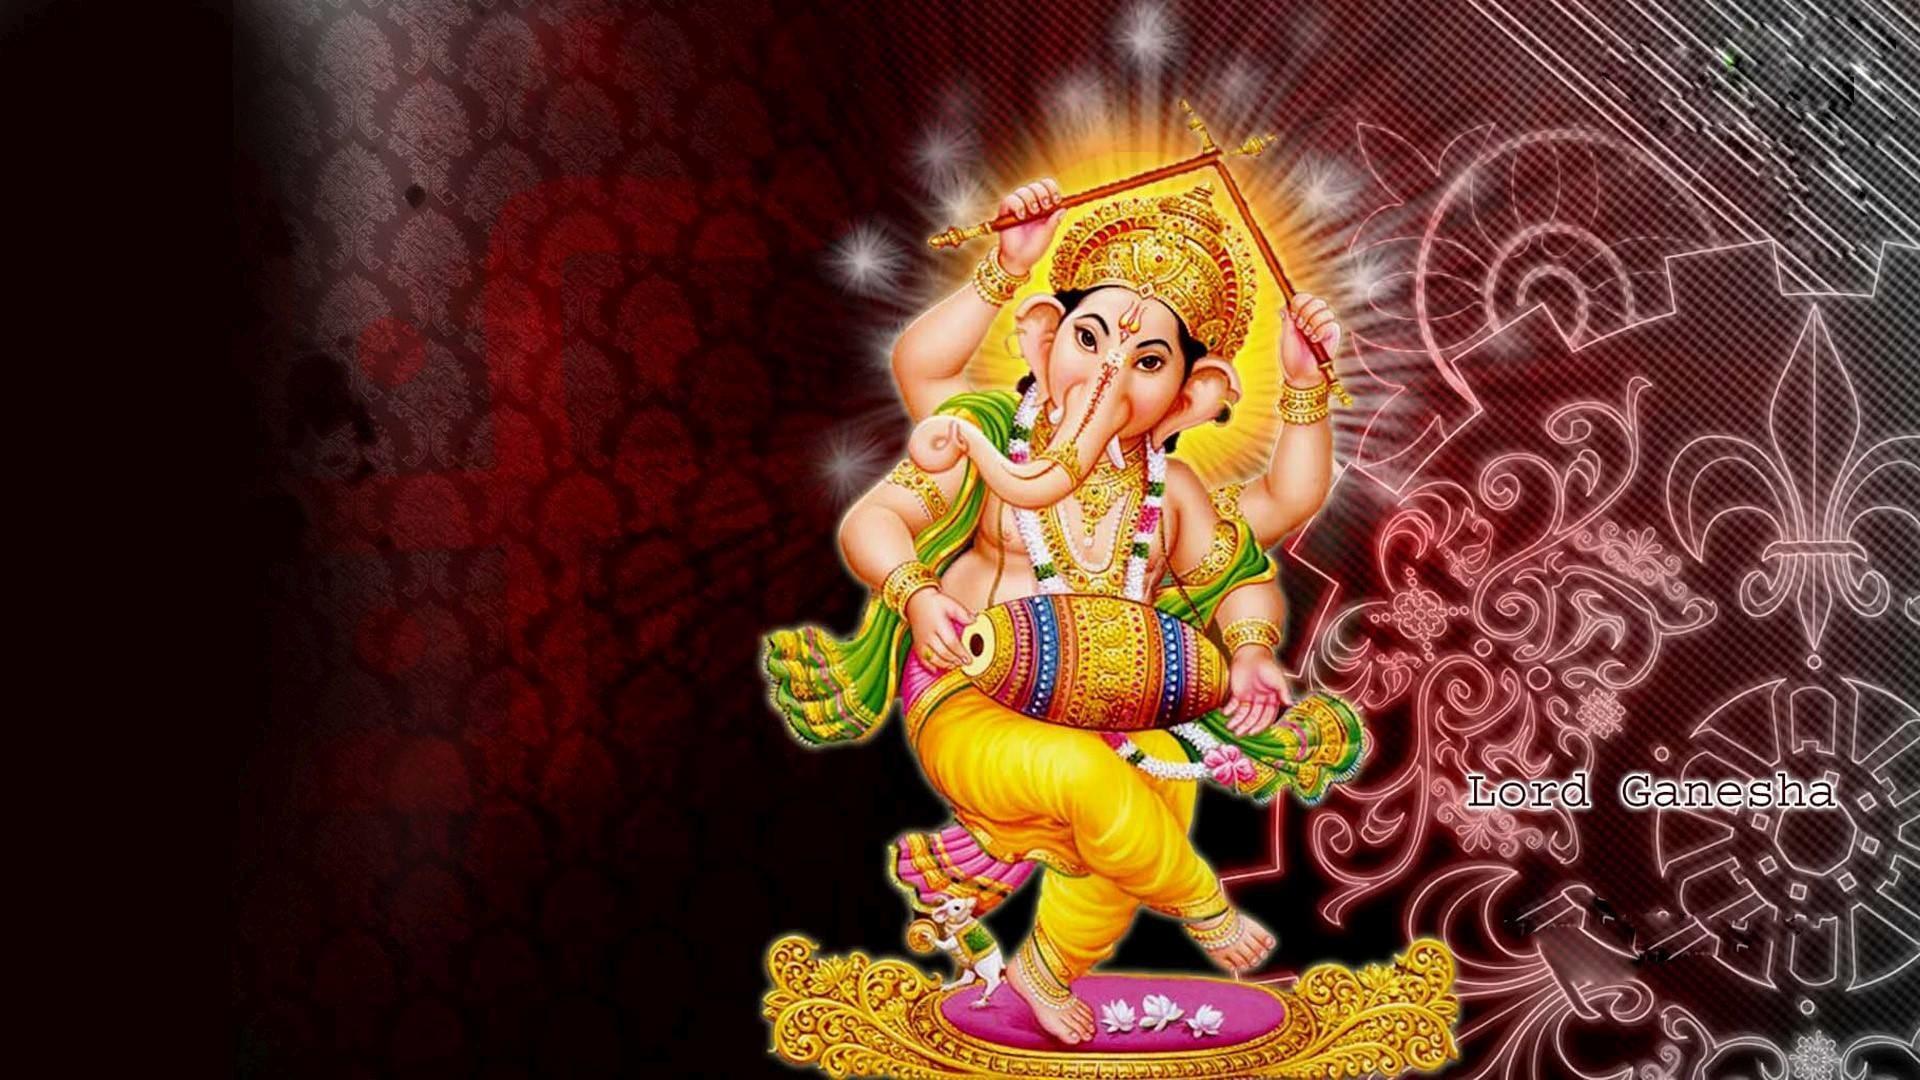 Lord Ganesha 1080p Indian God HD Desktop Wallpapers